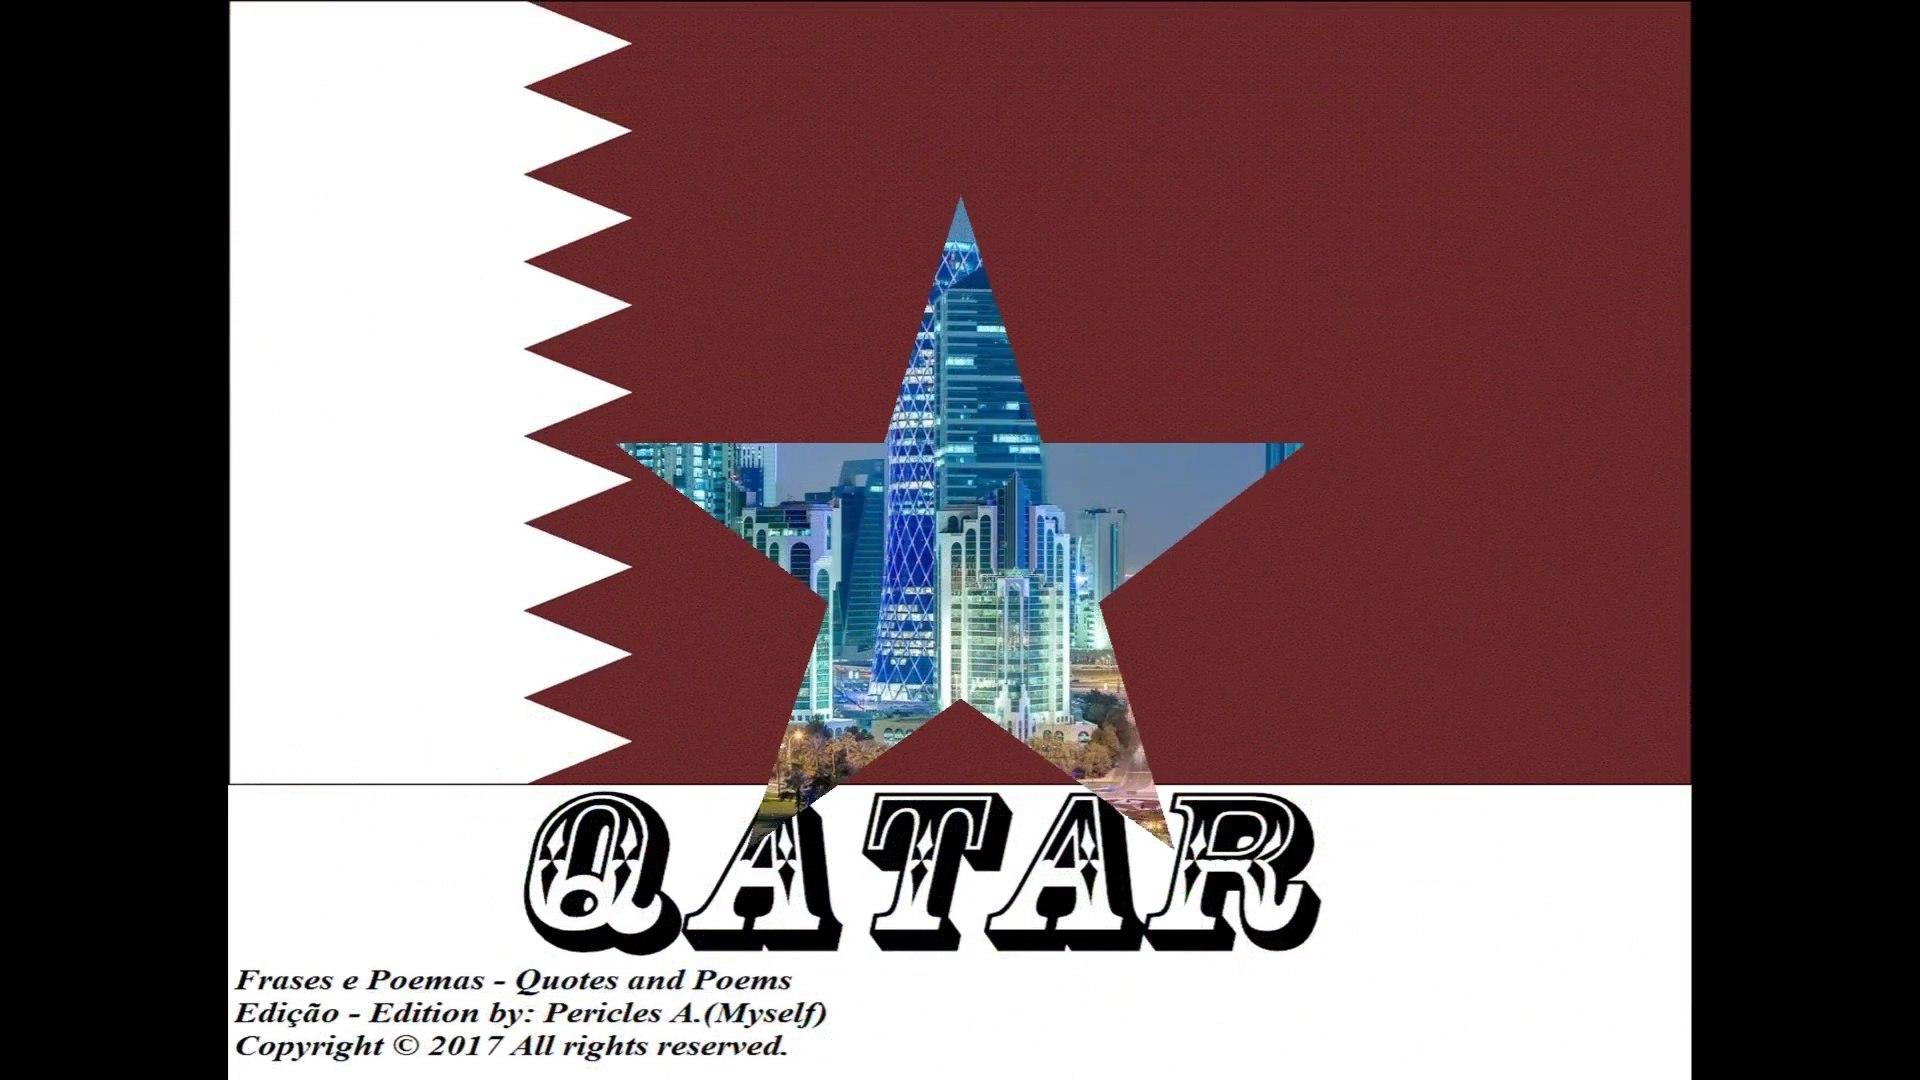 Bandeiras e fotos dos países do mundo: Qatar [Frases e Poemas]